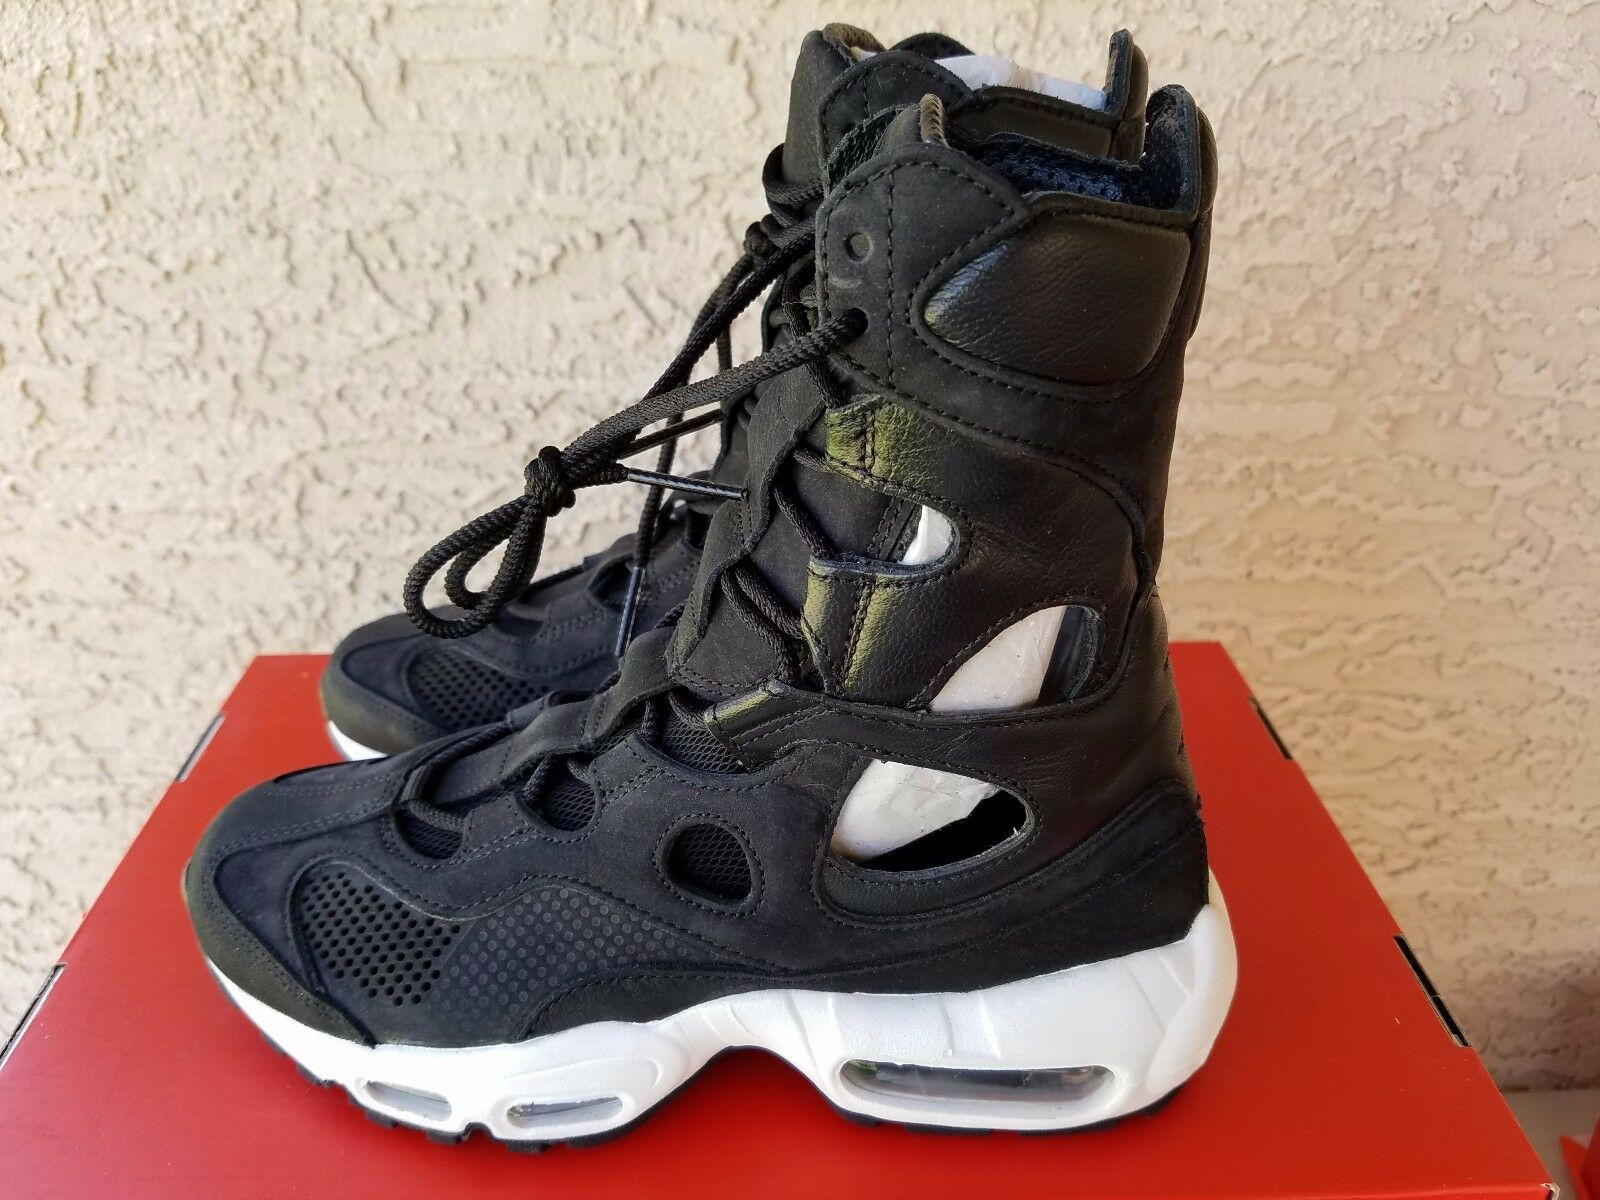 Nike NikeLab Air Max Empire Black 844696-001 Size 8.5  300